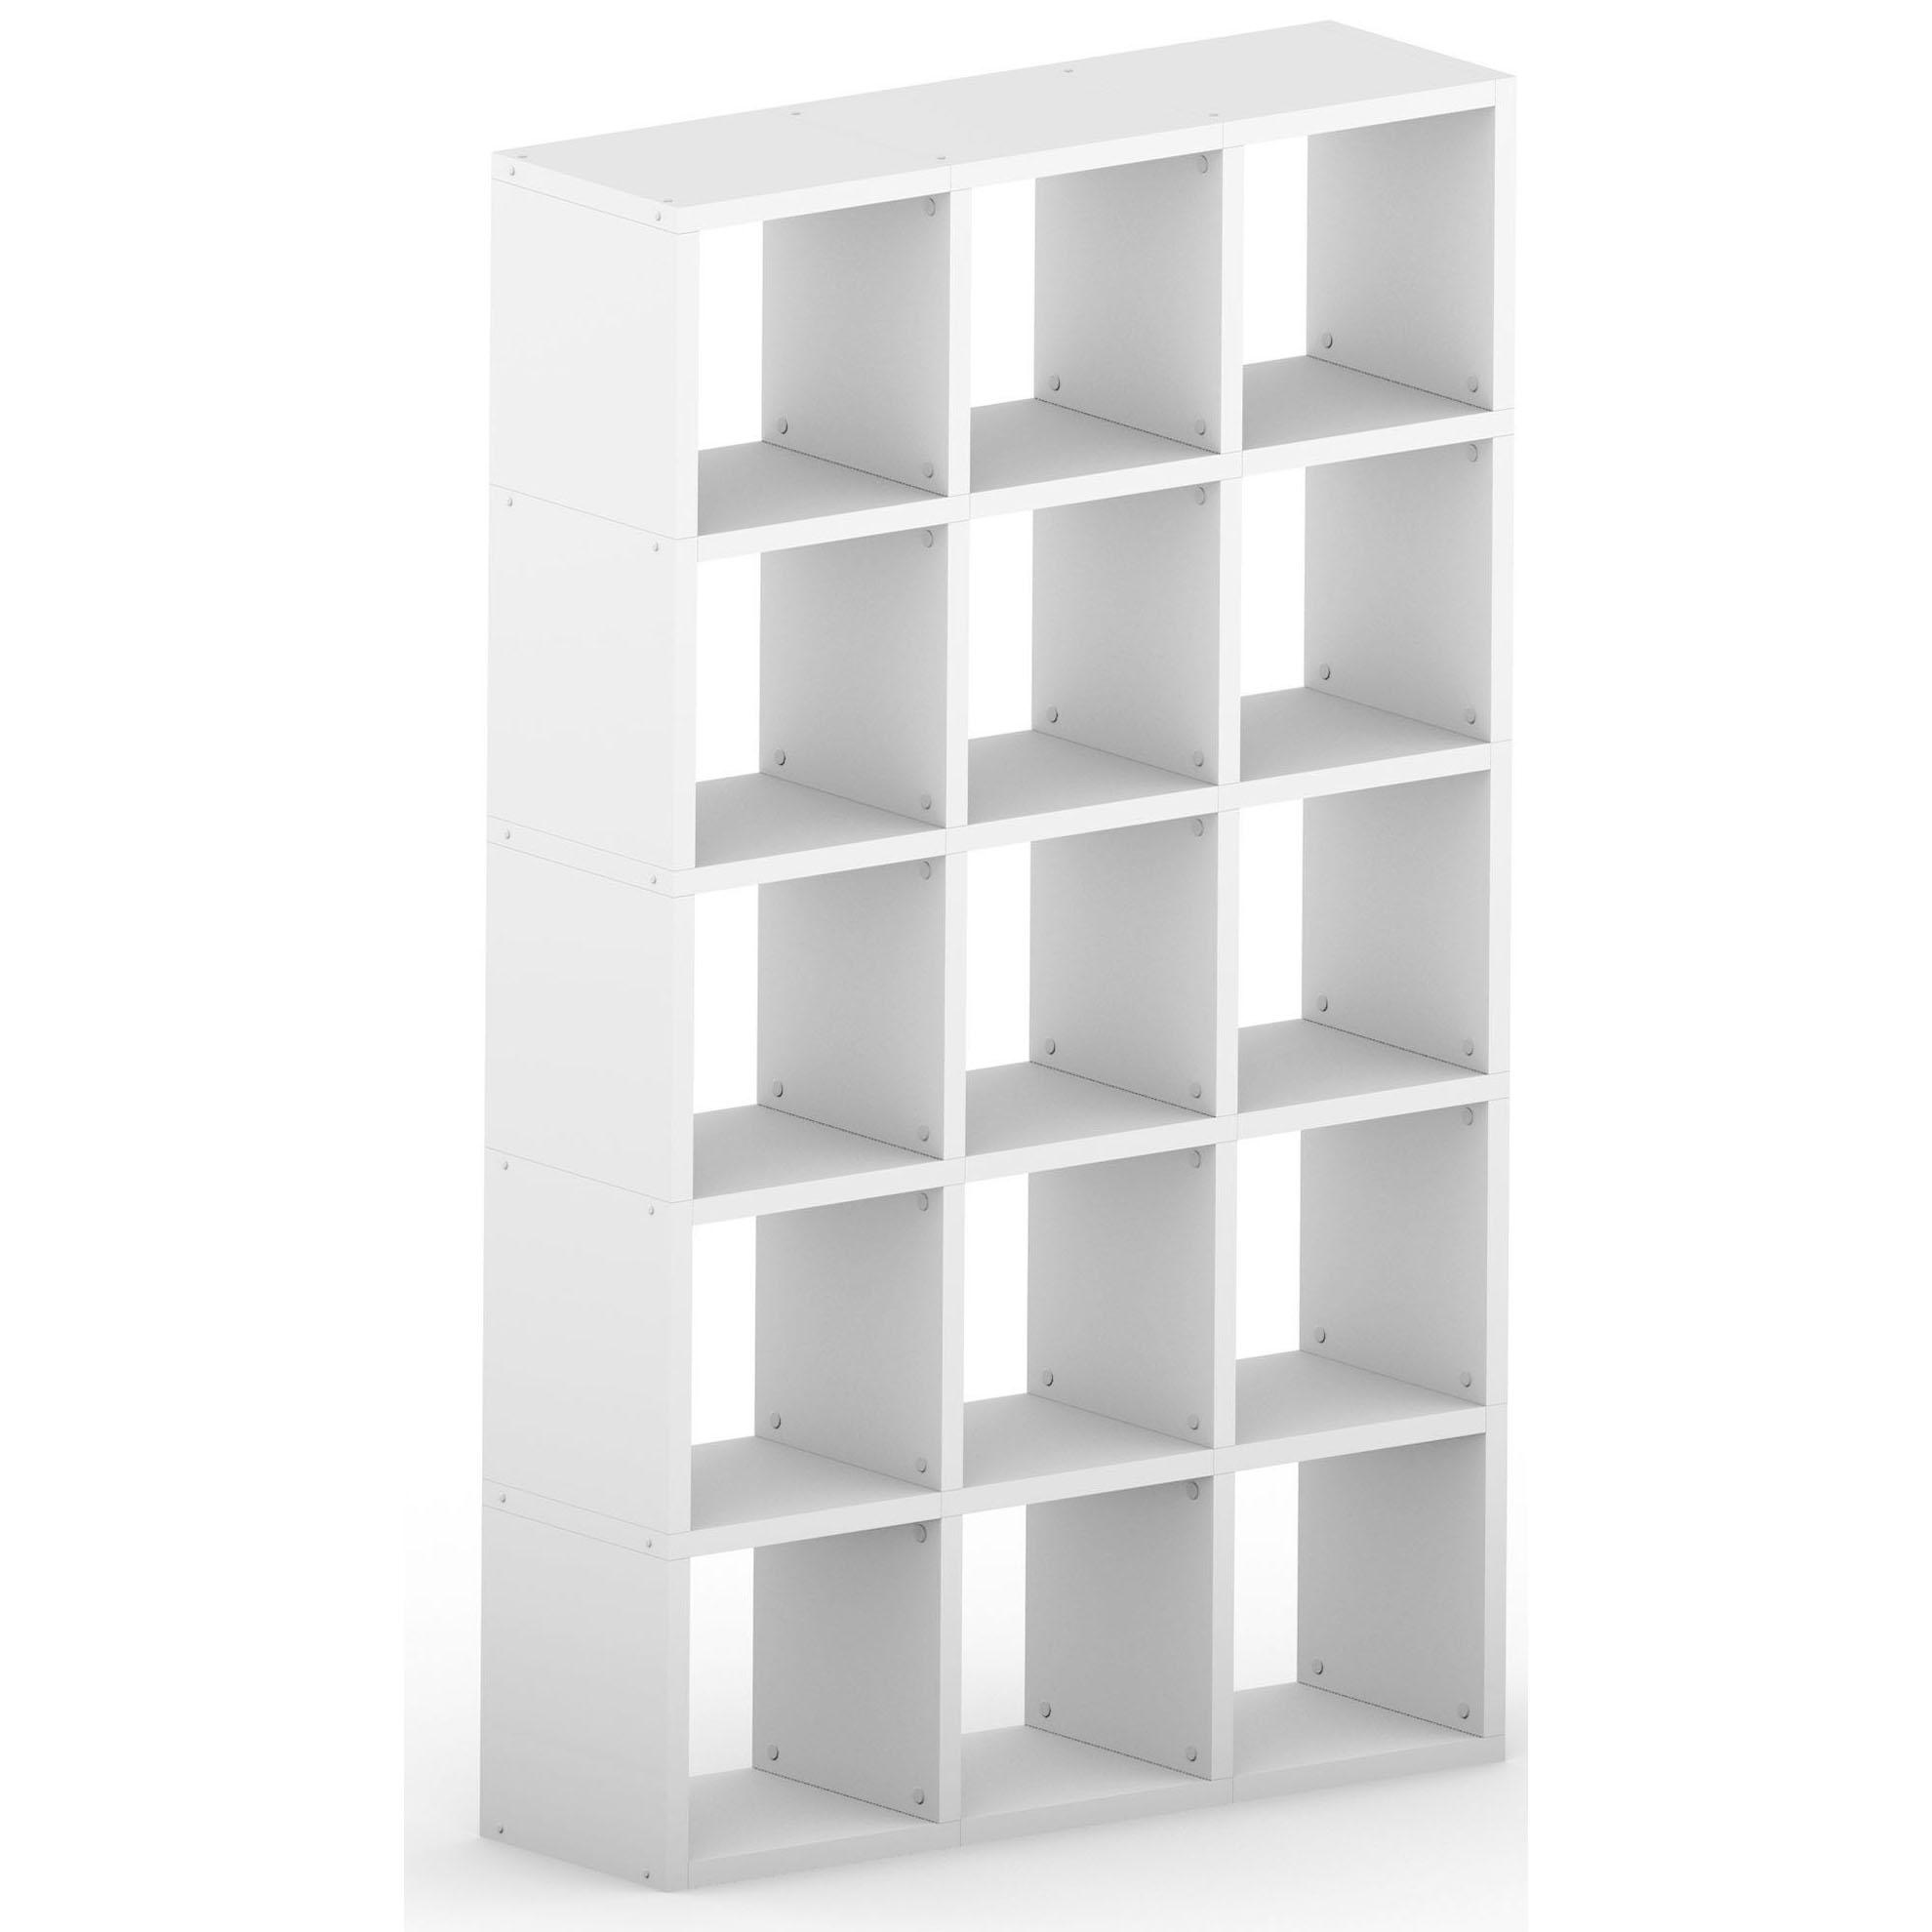 White Modular Cube 5x3 Vertical 1096l X 1808h X 328d